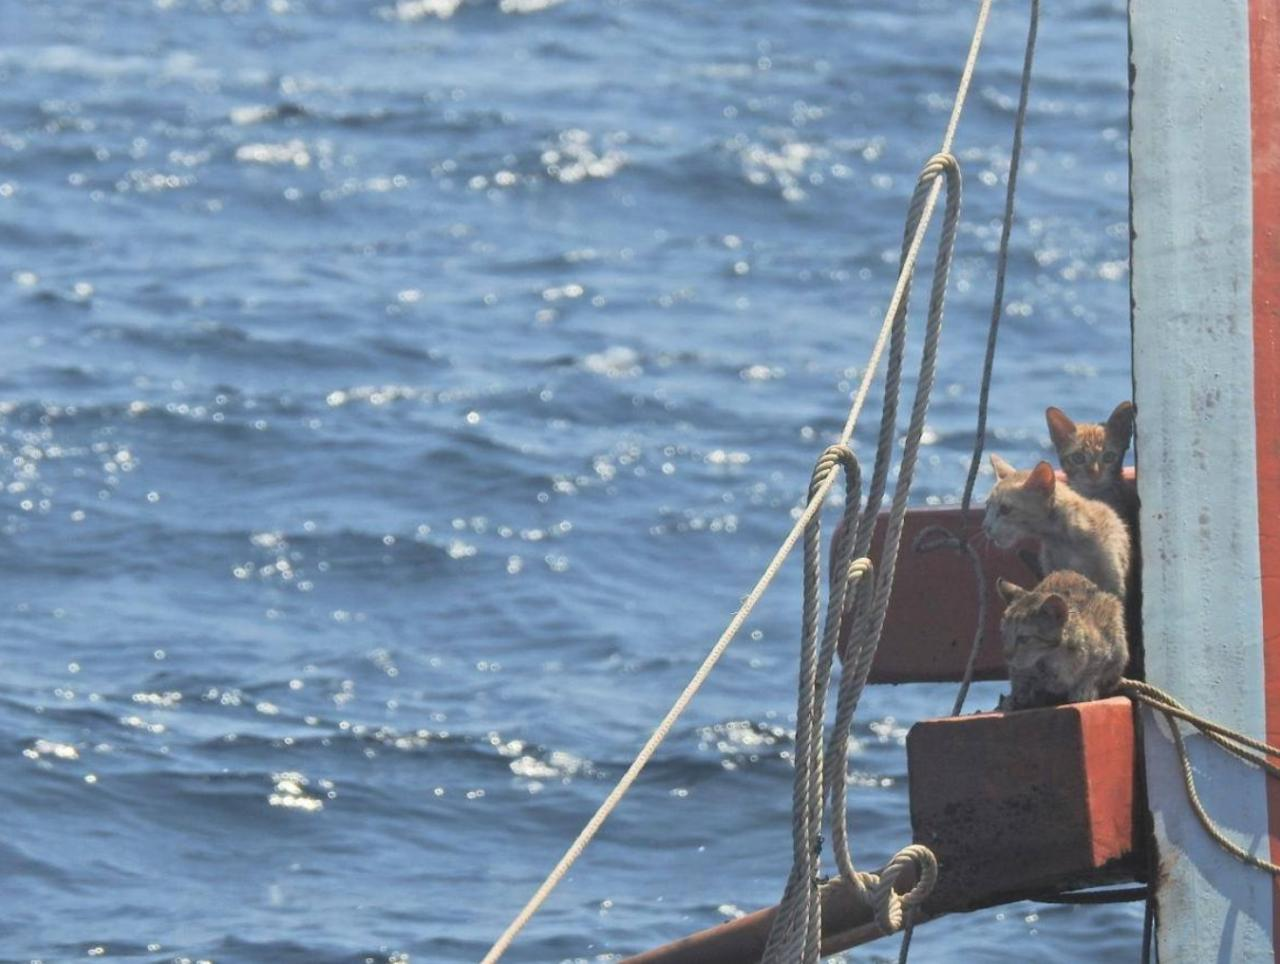 Ingat Tiada 'Mangsa' Tertinggal, Penyelamat Perasan Ada 4 Ekor Kucing Berada Di Kapal Kebakaran Di Tengah Laut